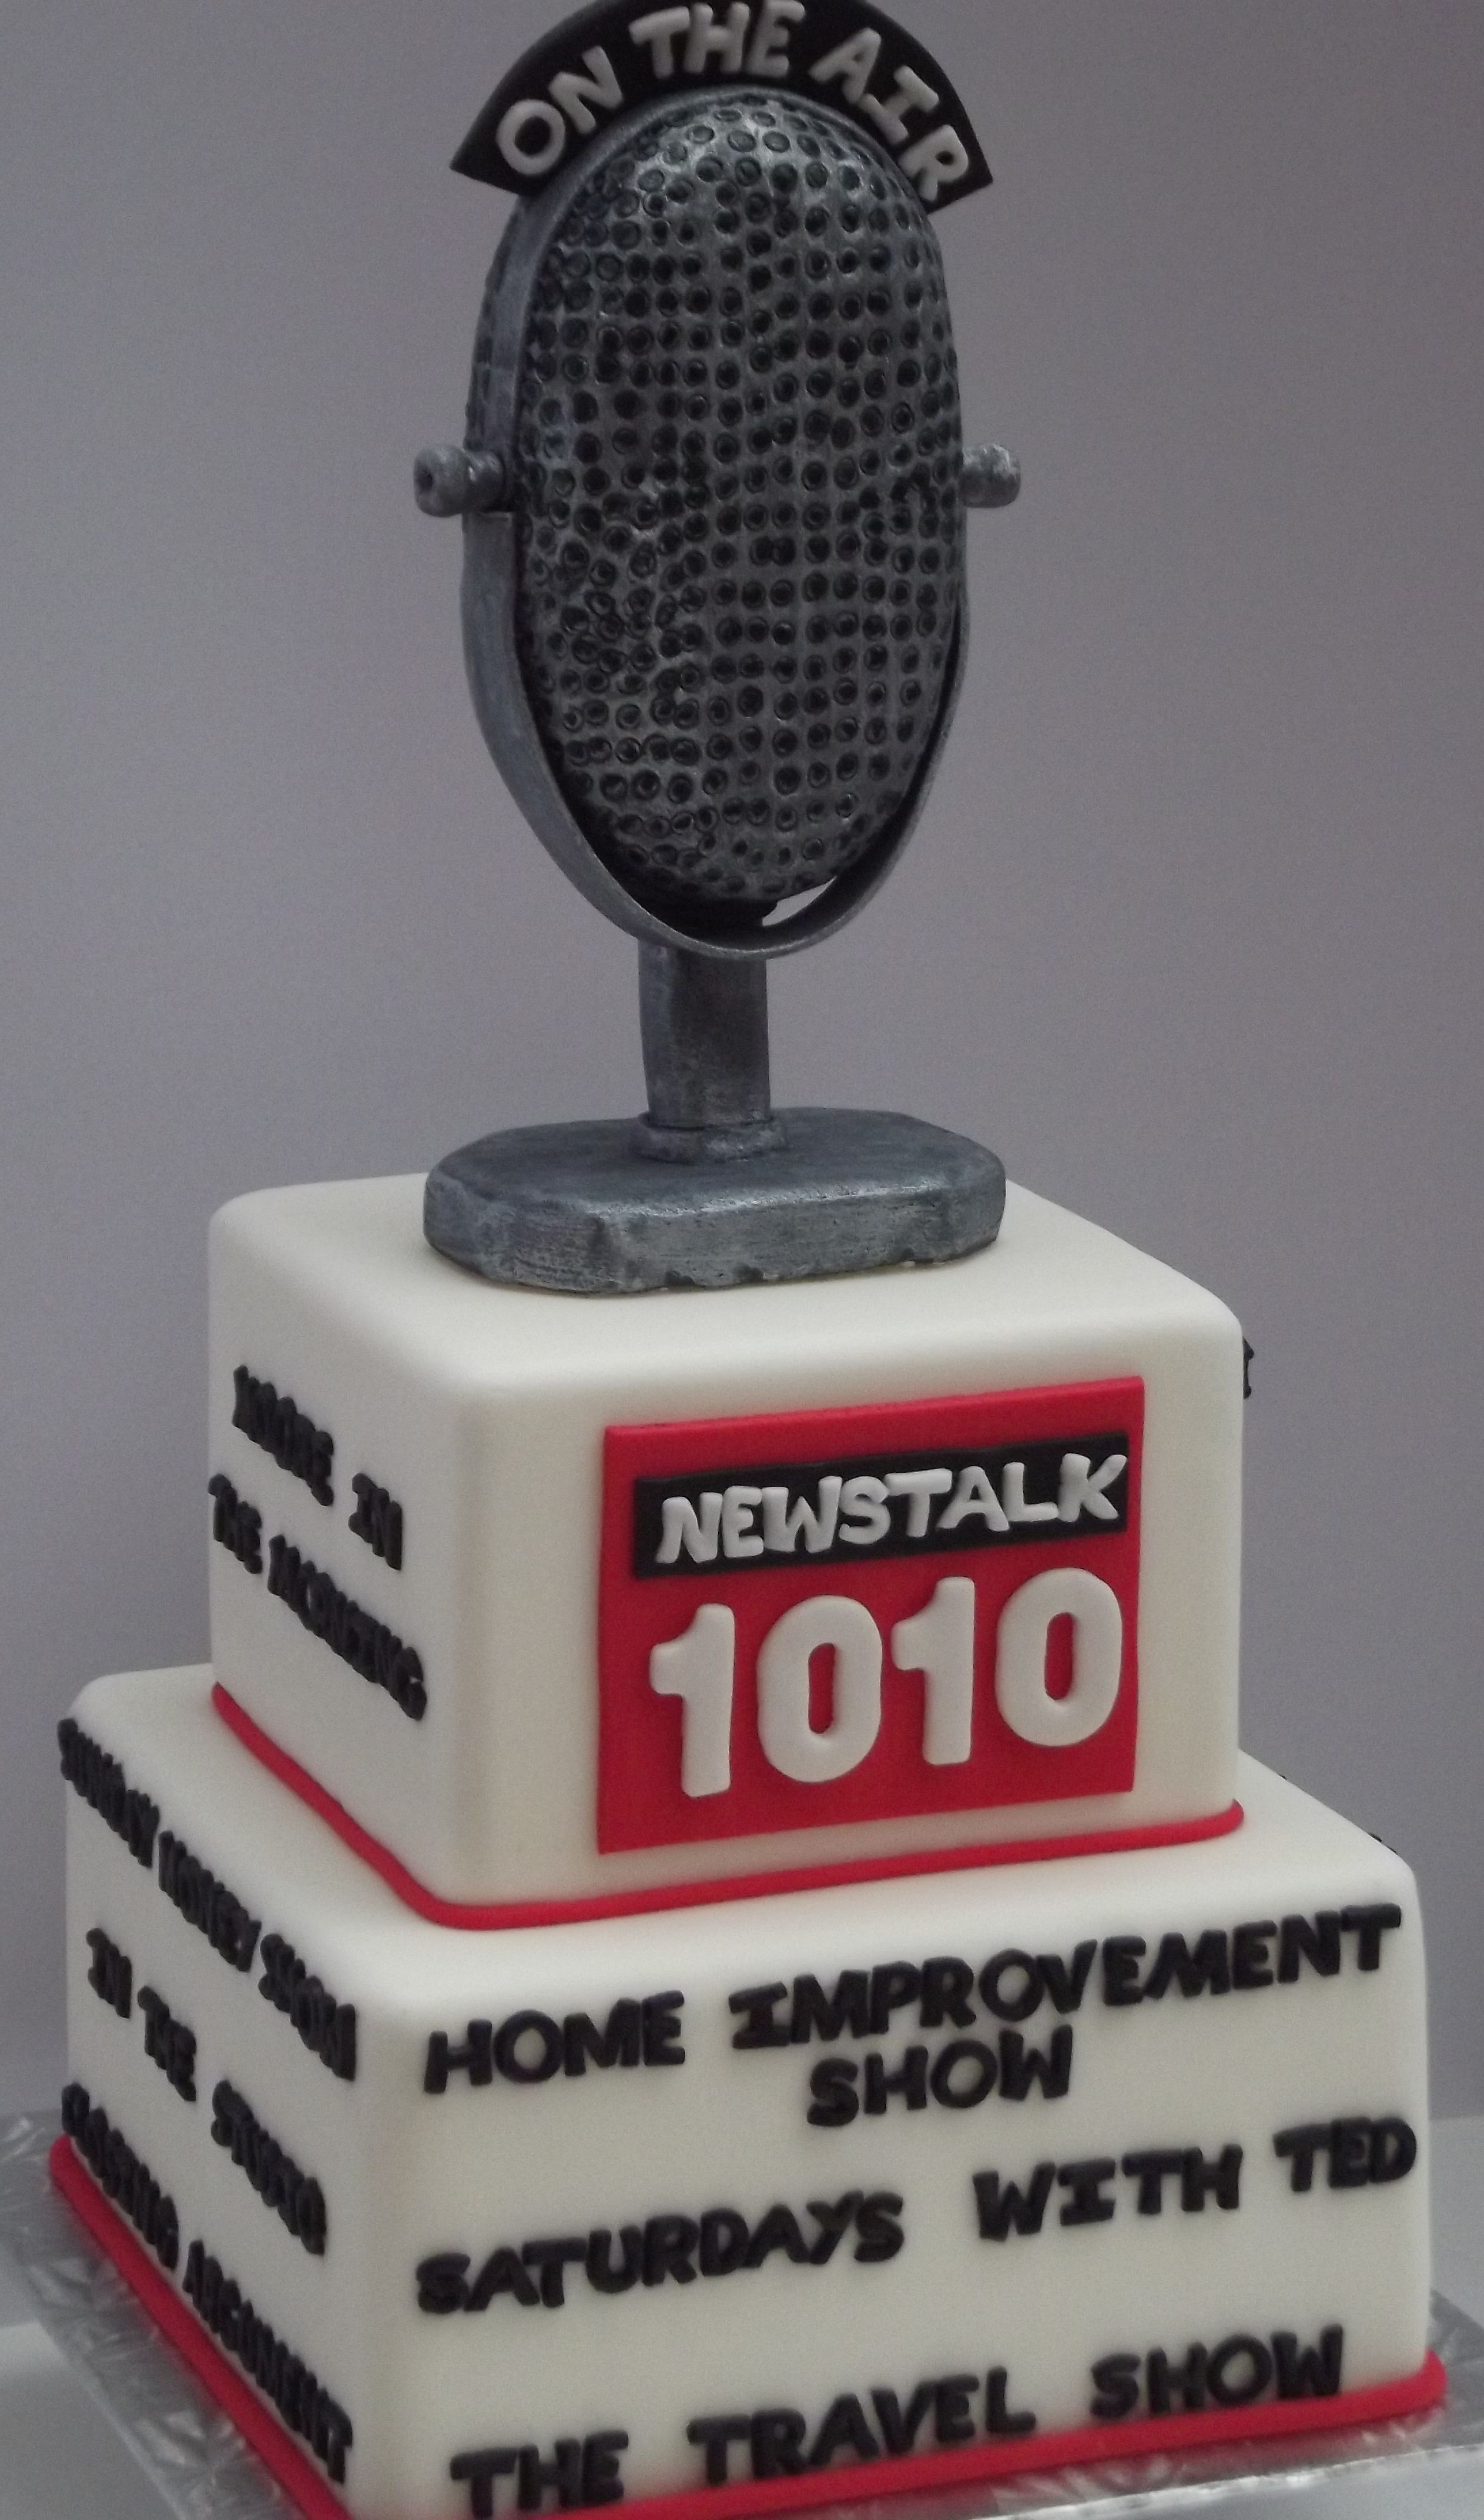 Custom cake for Newstalk 1010- love the microphone design!